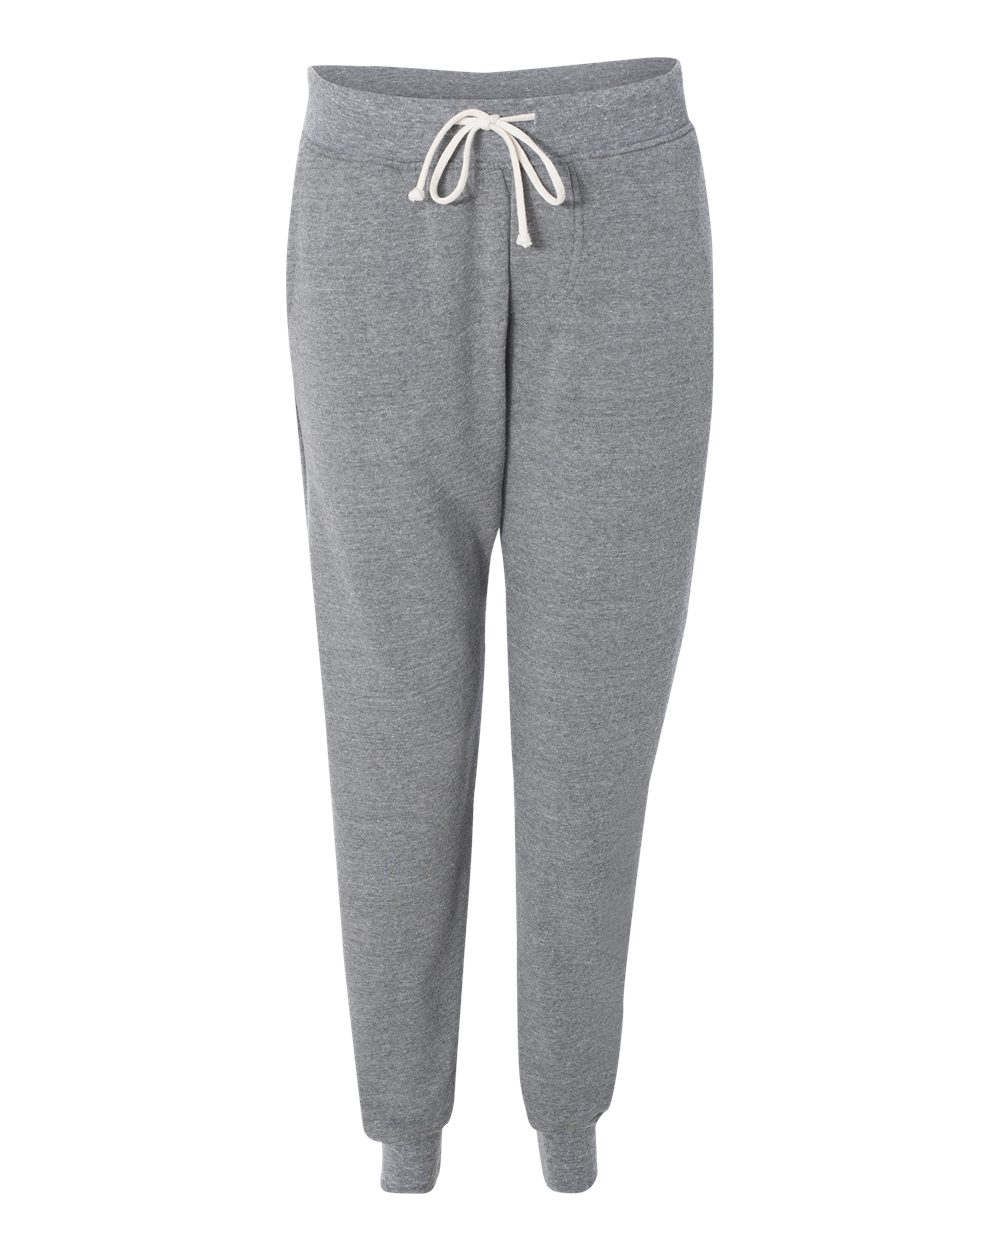 Alternative-Mens-Eco-Fleece-Dodgeball-Pants-Sweatpants-Pocket-9881-up-to-2XL thumbnail 9